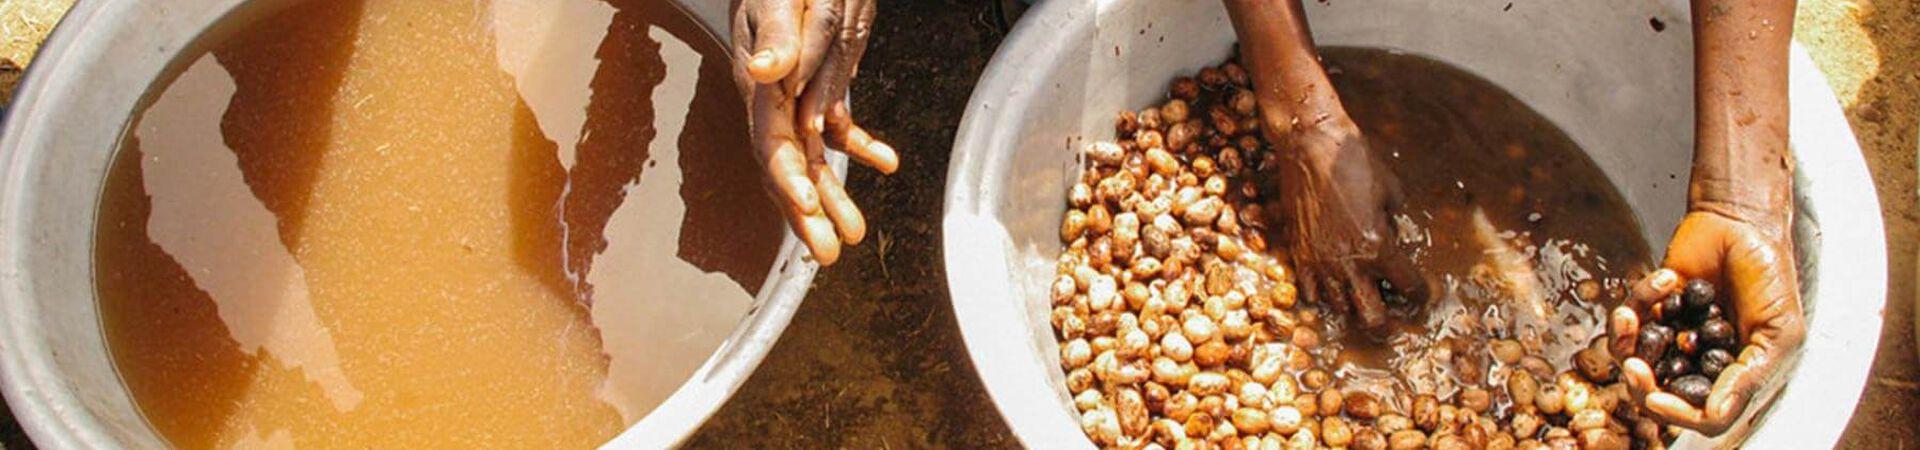 Banner - What is Fair Trade?